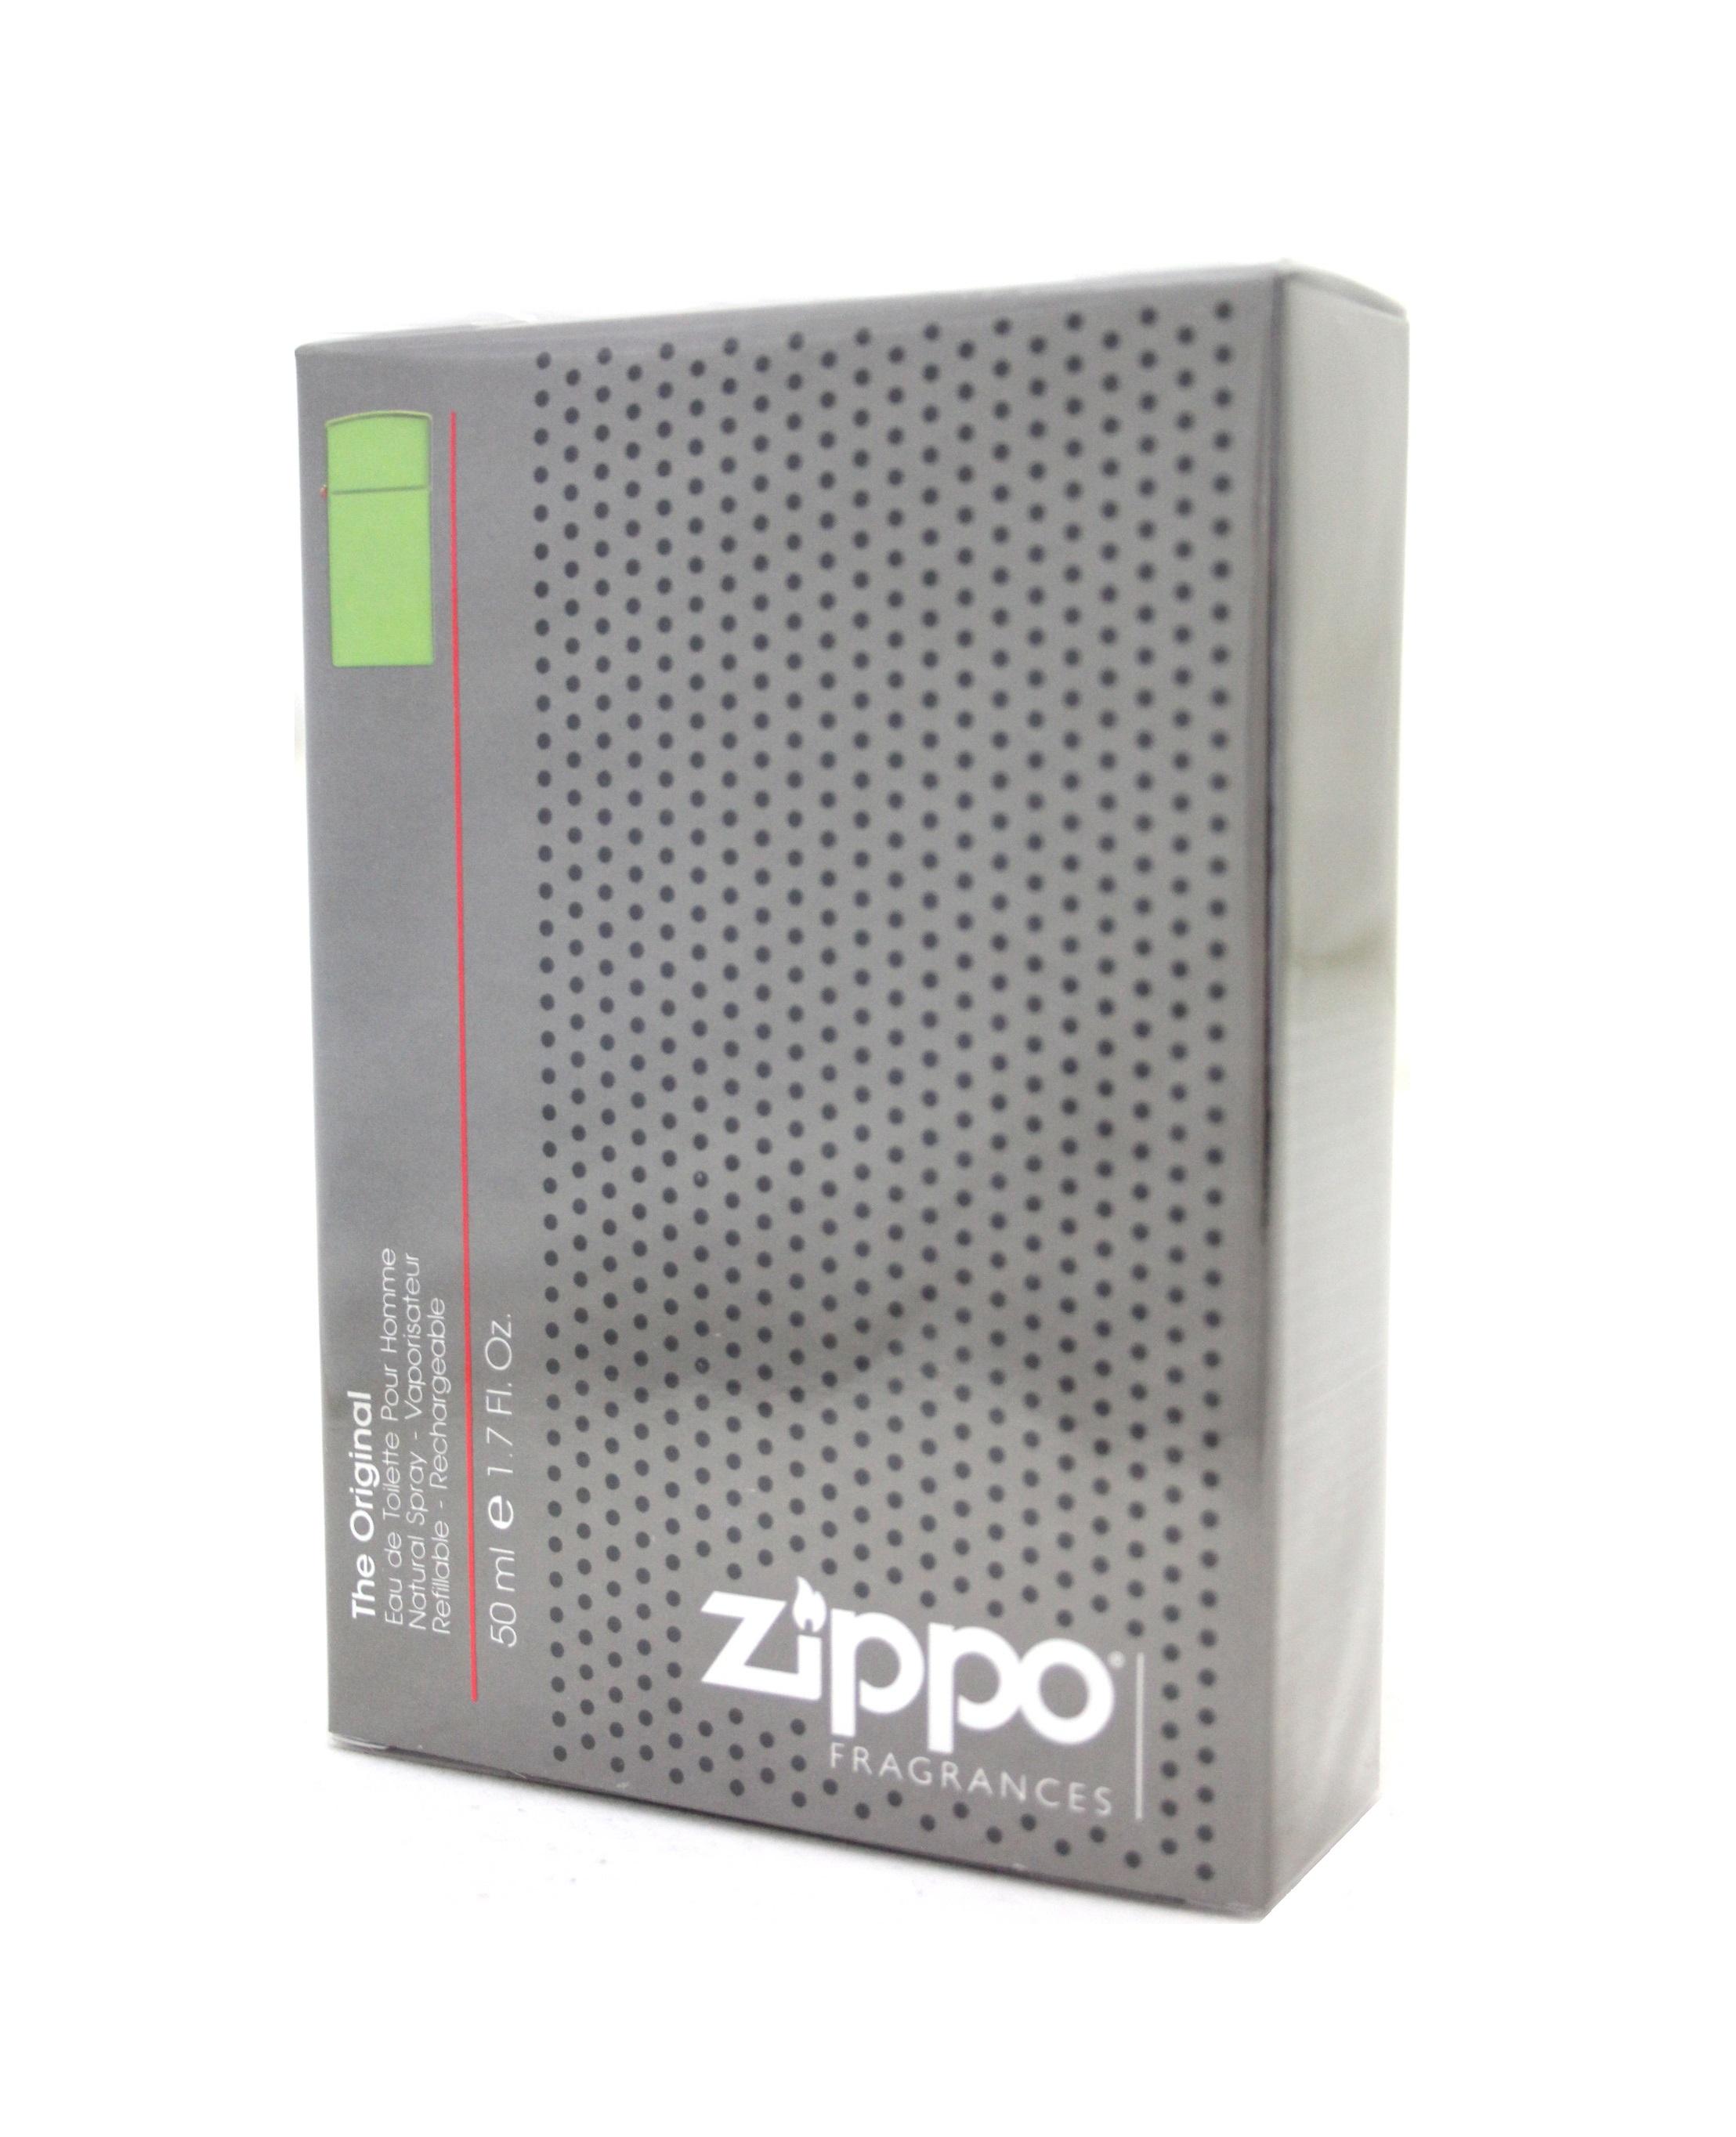 Zippo Fragrances Zippo Green Eau de Toilette